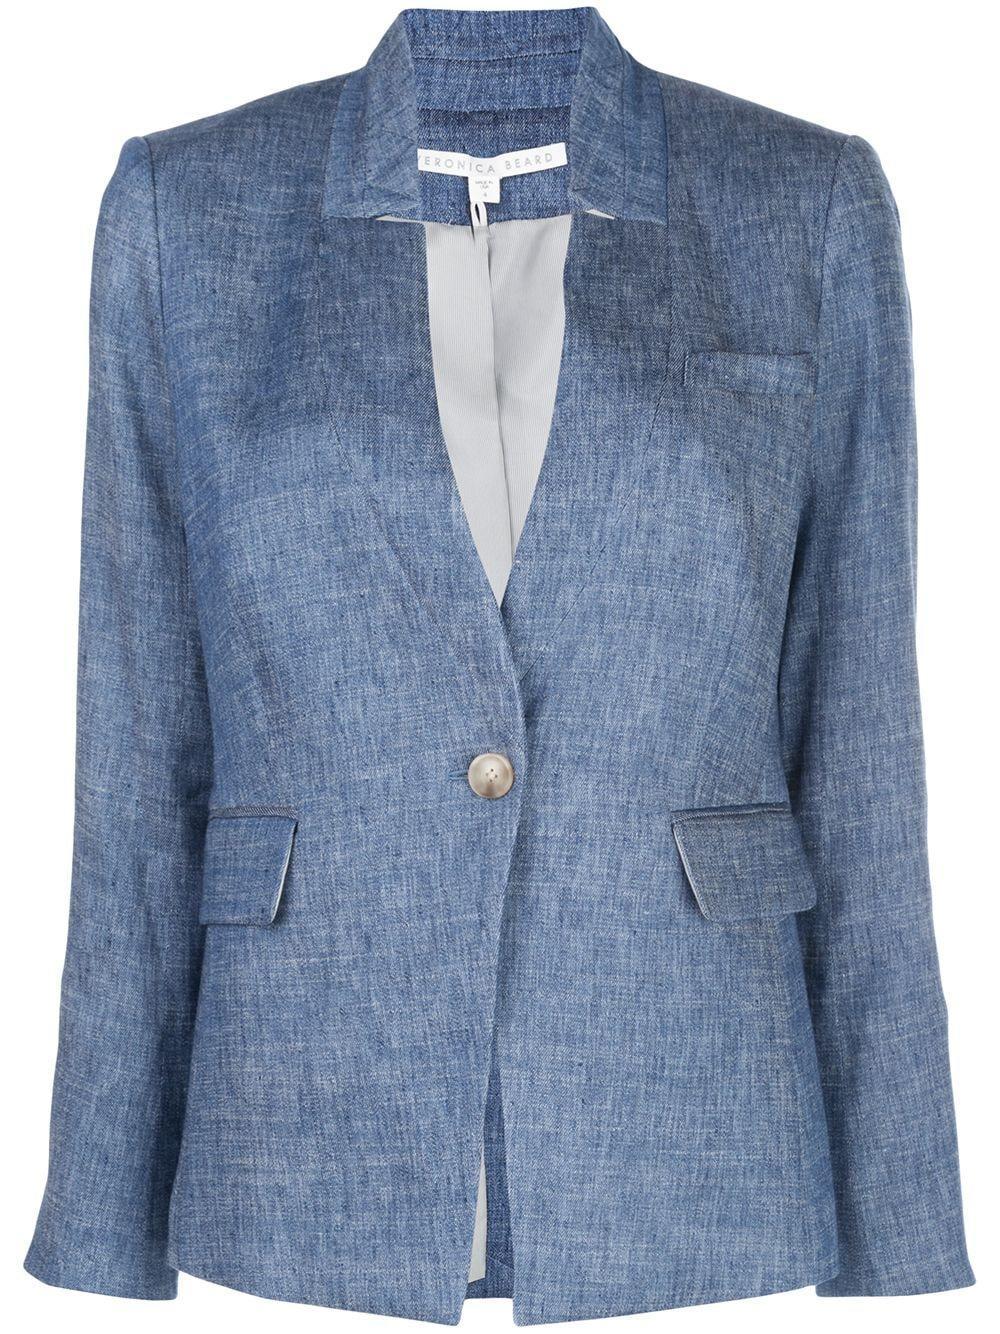 Linen Up Collar Jacket Item # CORELN0081293-S20